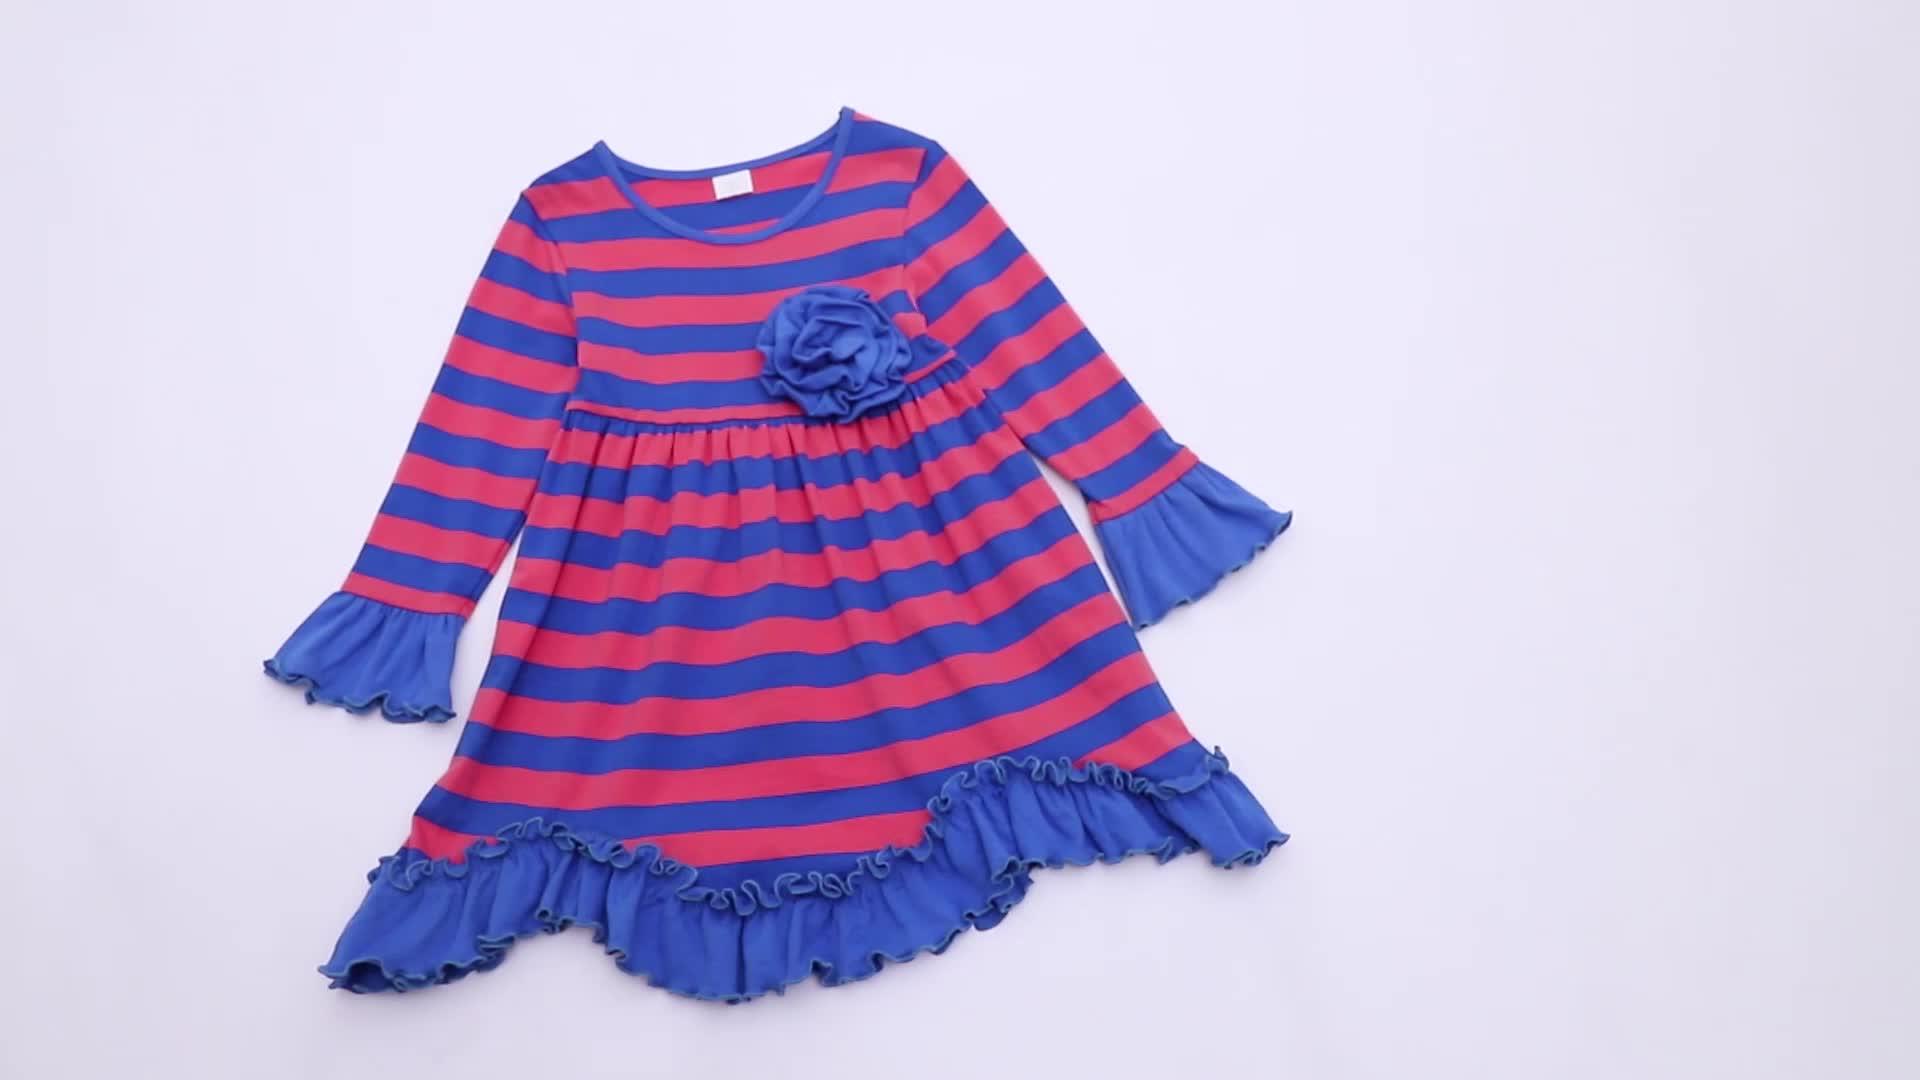 Groothandel ruche lente boutique jurken meisjes leeg jurken voor kids baby meisje jurken kinderen